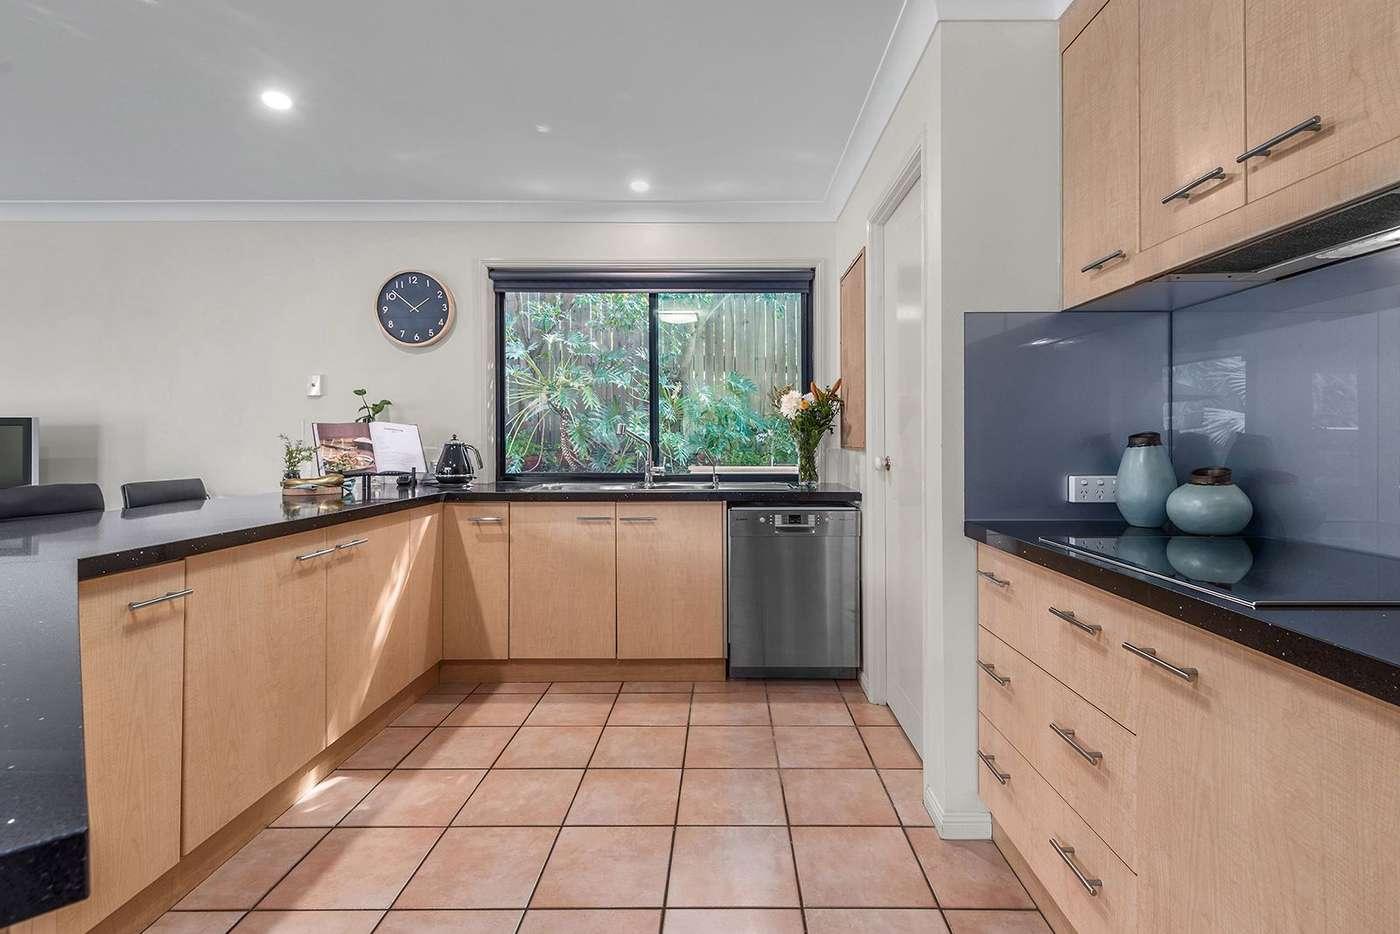 Seventh view of Homely house listing, 29 Casuarina Street, Bridgeman Downs QLD 4035